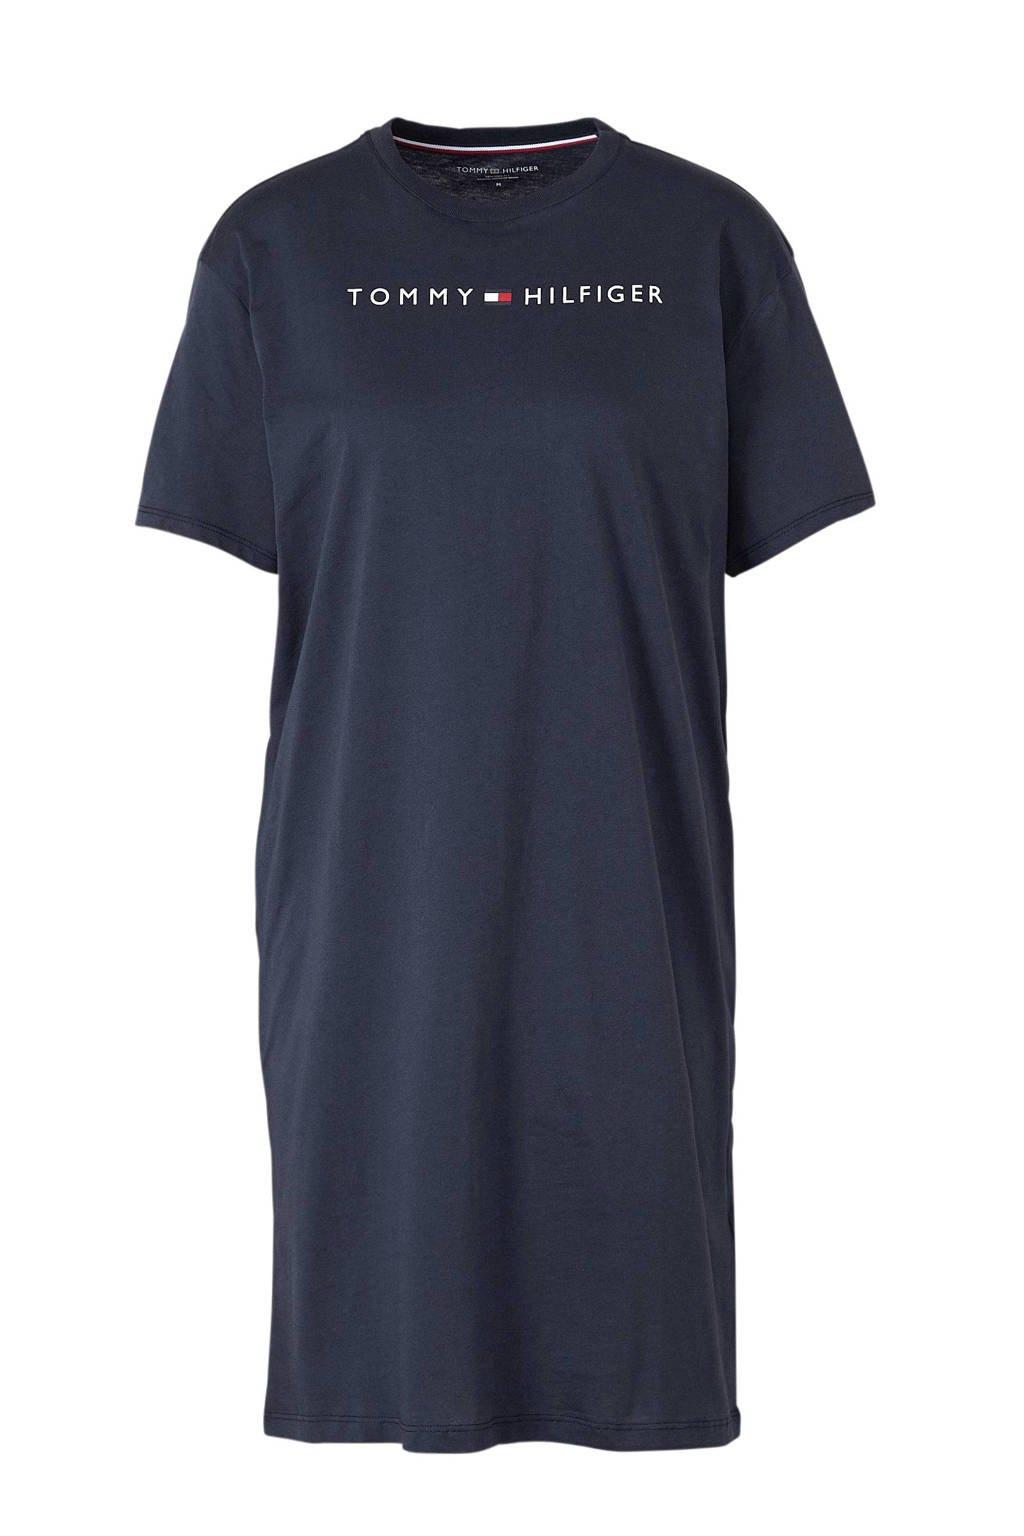 Tommy Hilfiger nachthemd marine, Marine